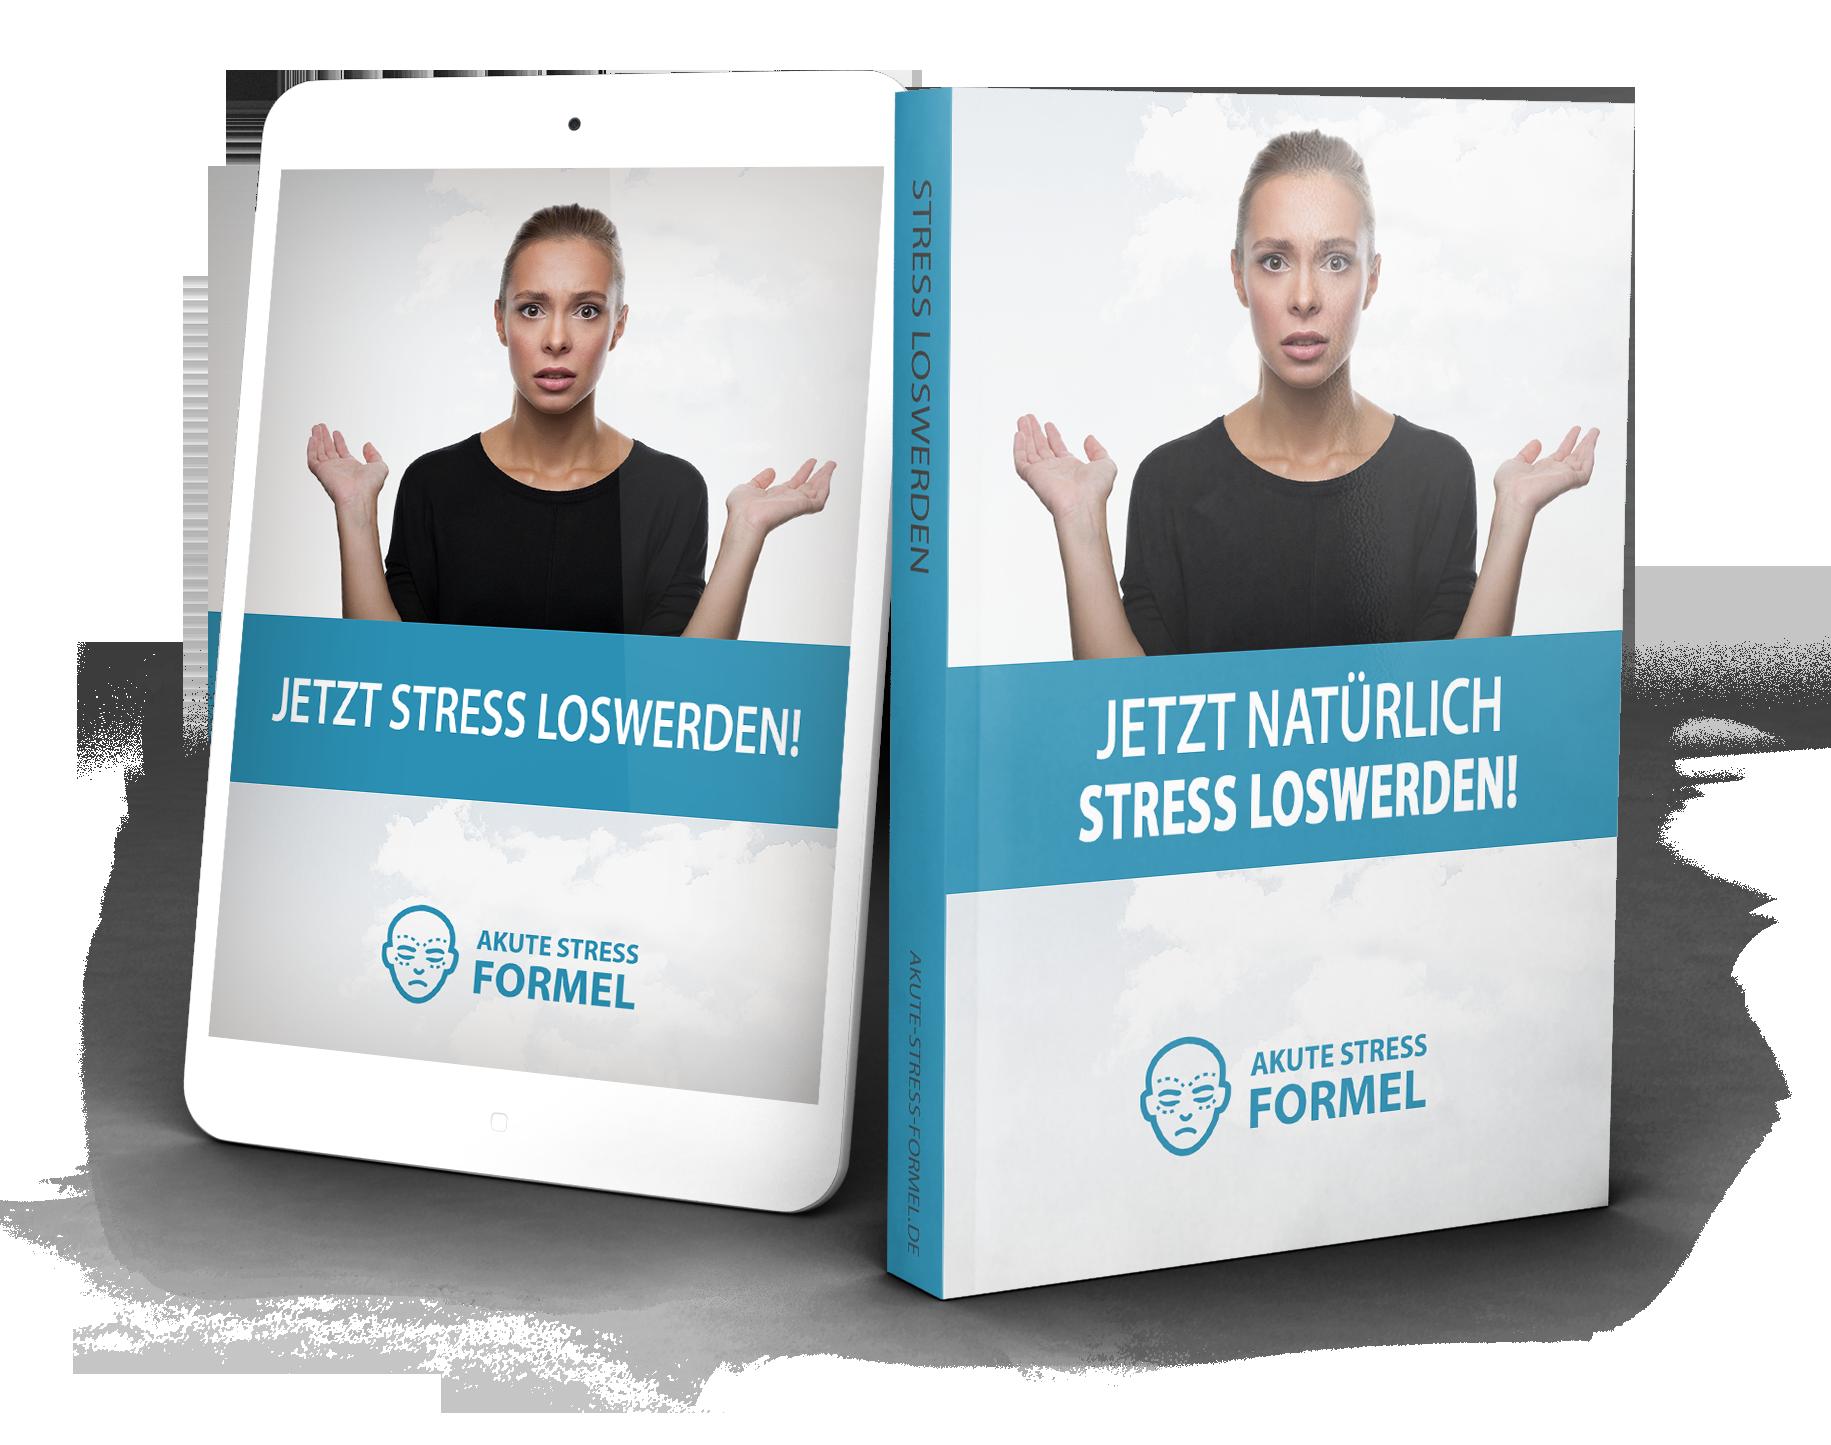 Akut Stress Formel